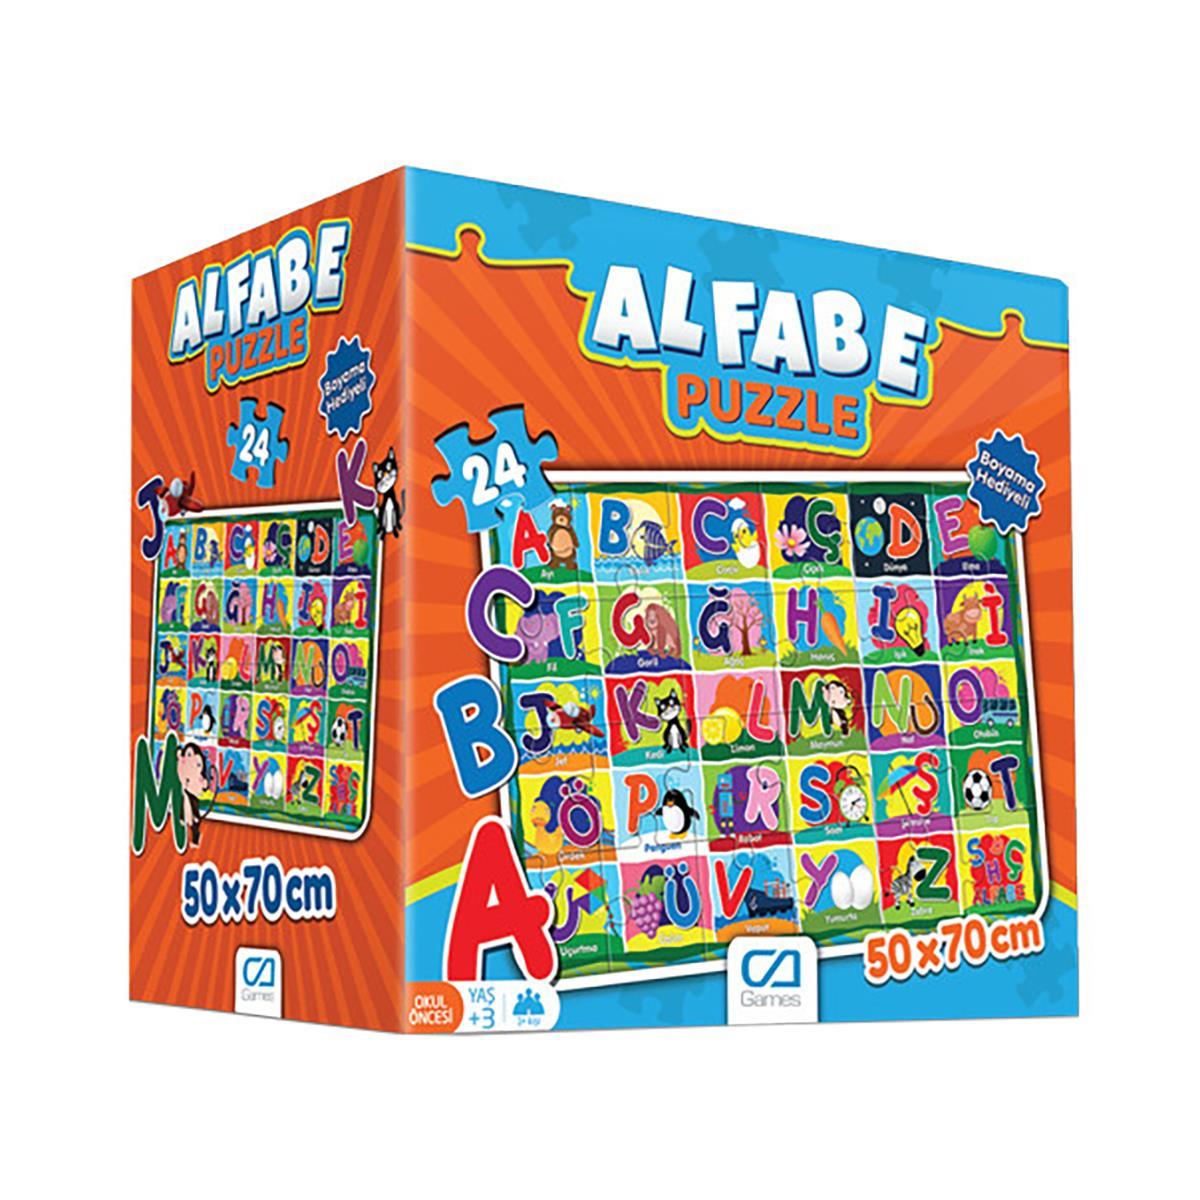 Ca Oyuncak Ca5027 Ca Games Alfabe Puzzle 3 Yaş